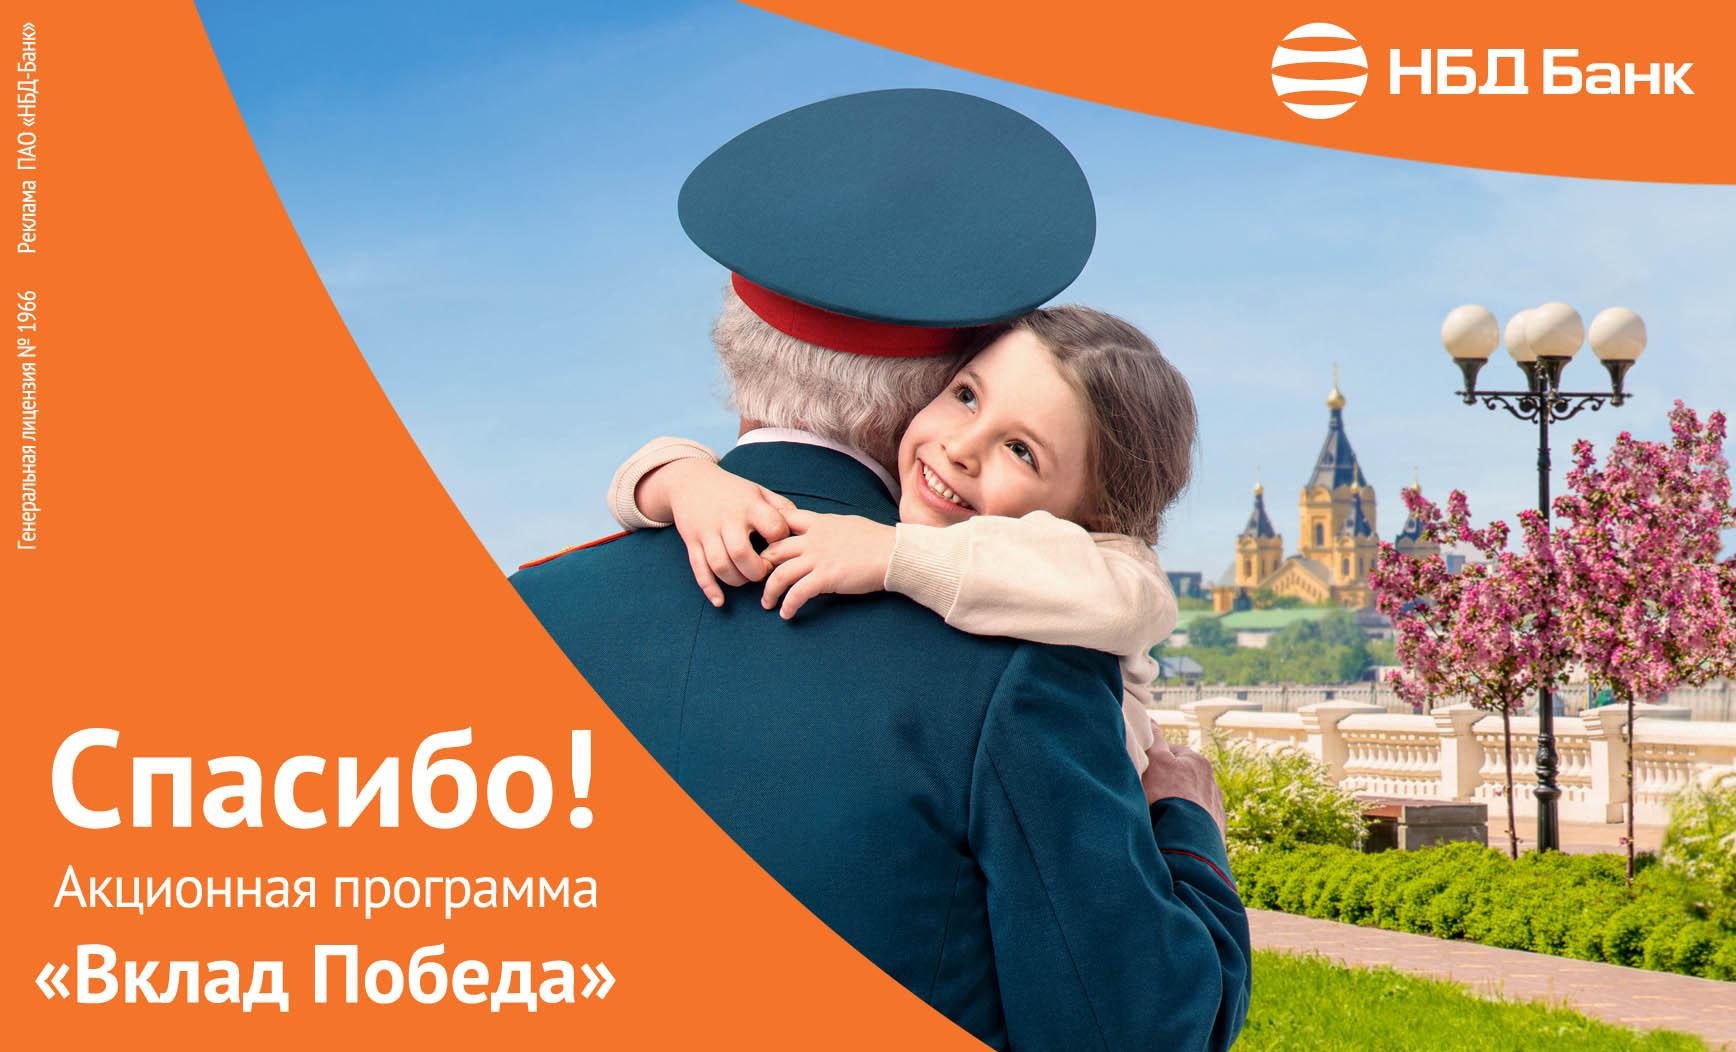 НБД-Банк запустил акционную программу «Вклад «Победа»